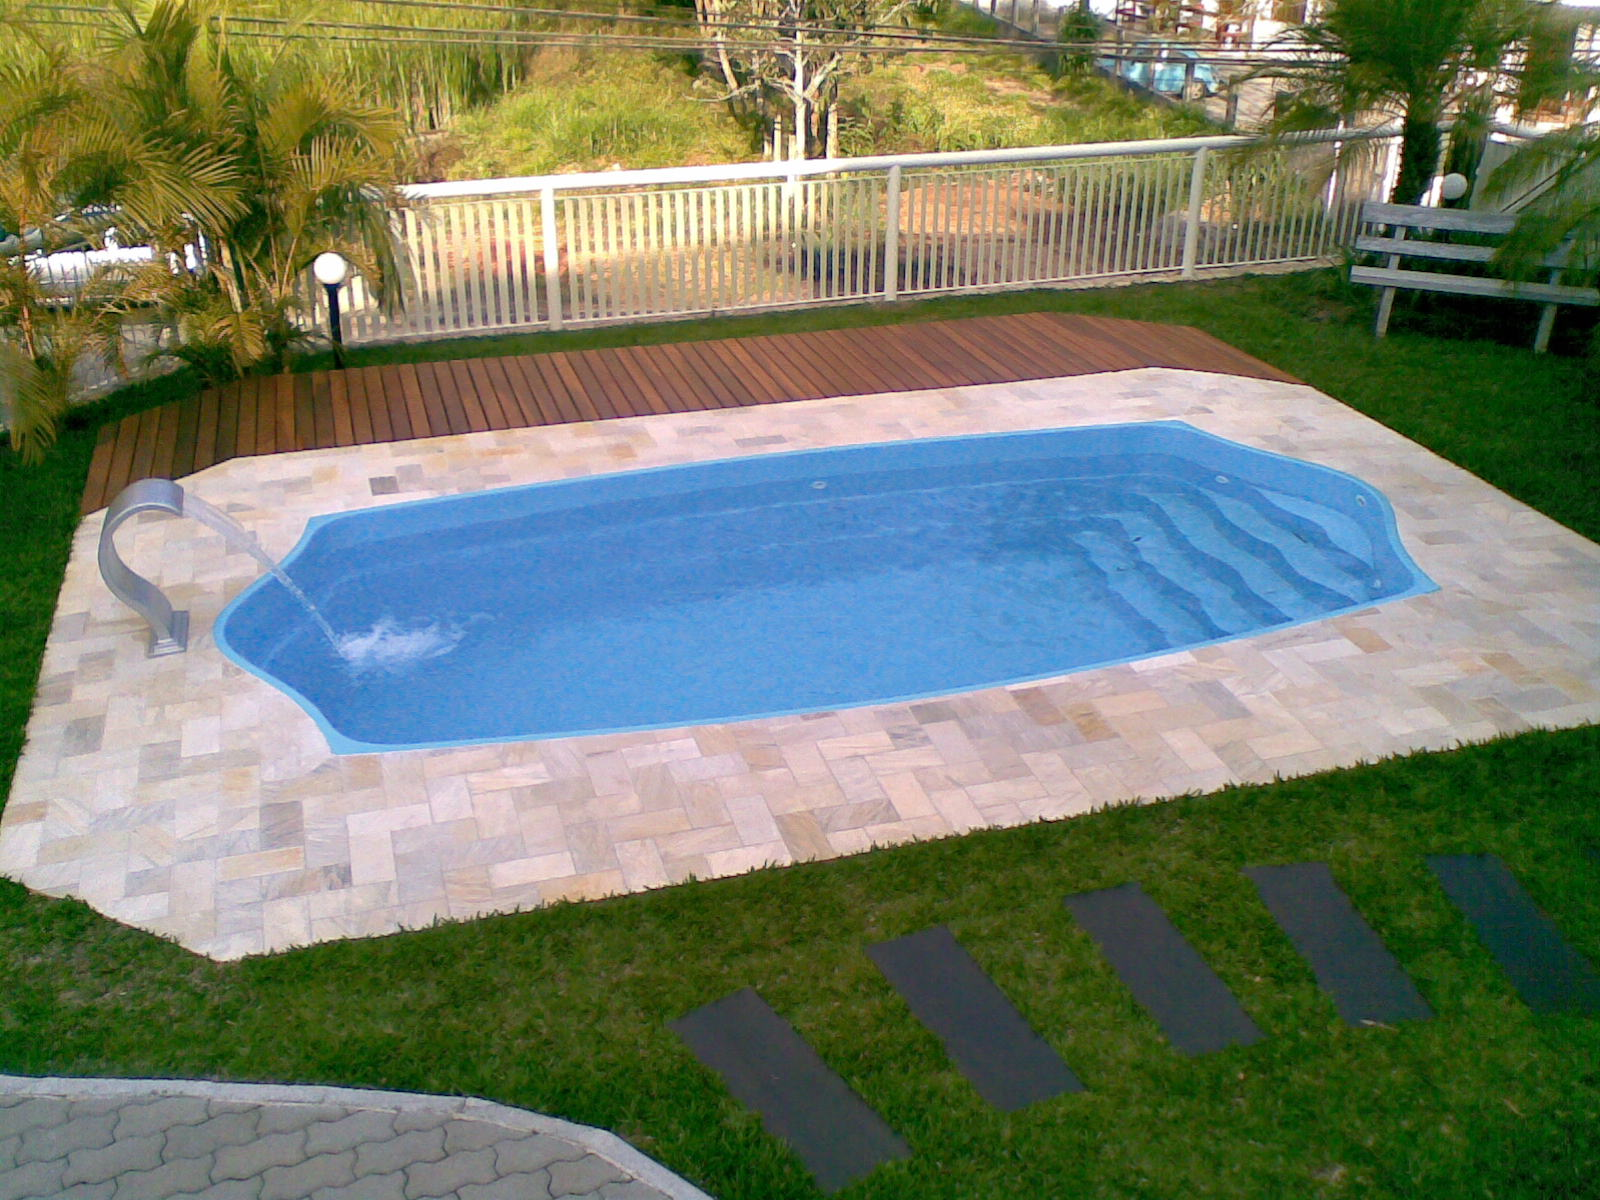 Marmoraria e piscinas vit ria piscina for Piscinas vitoria